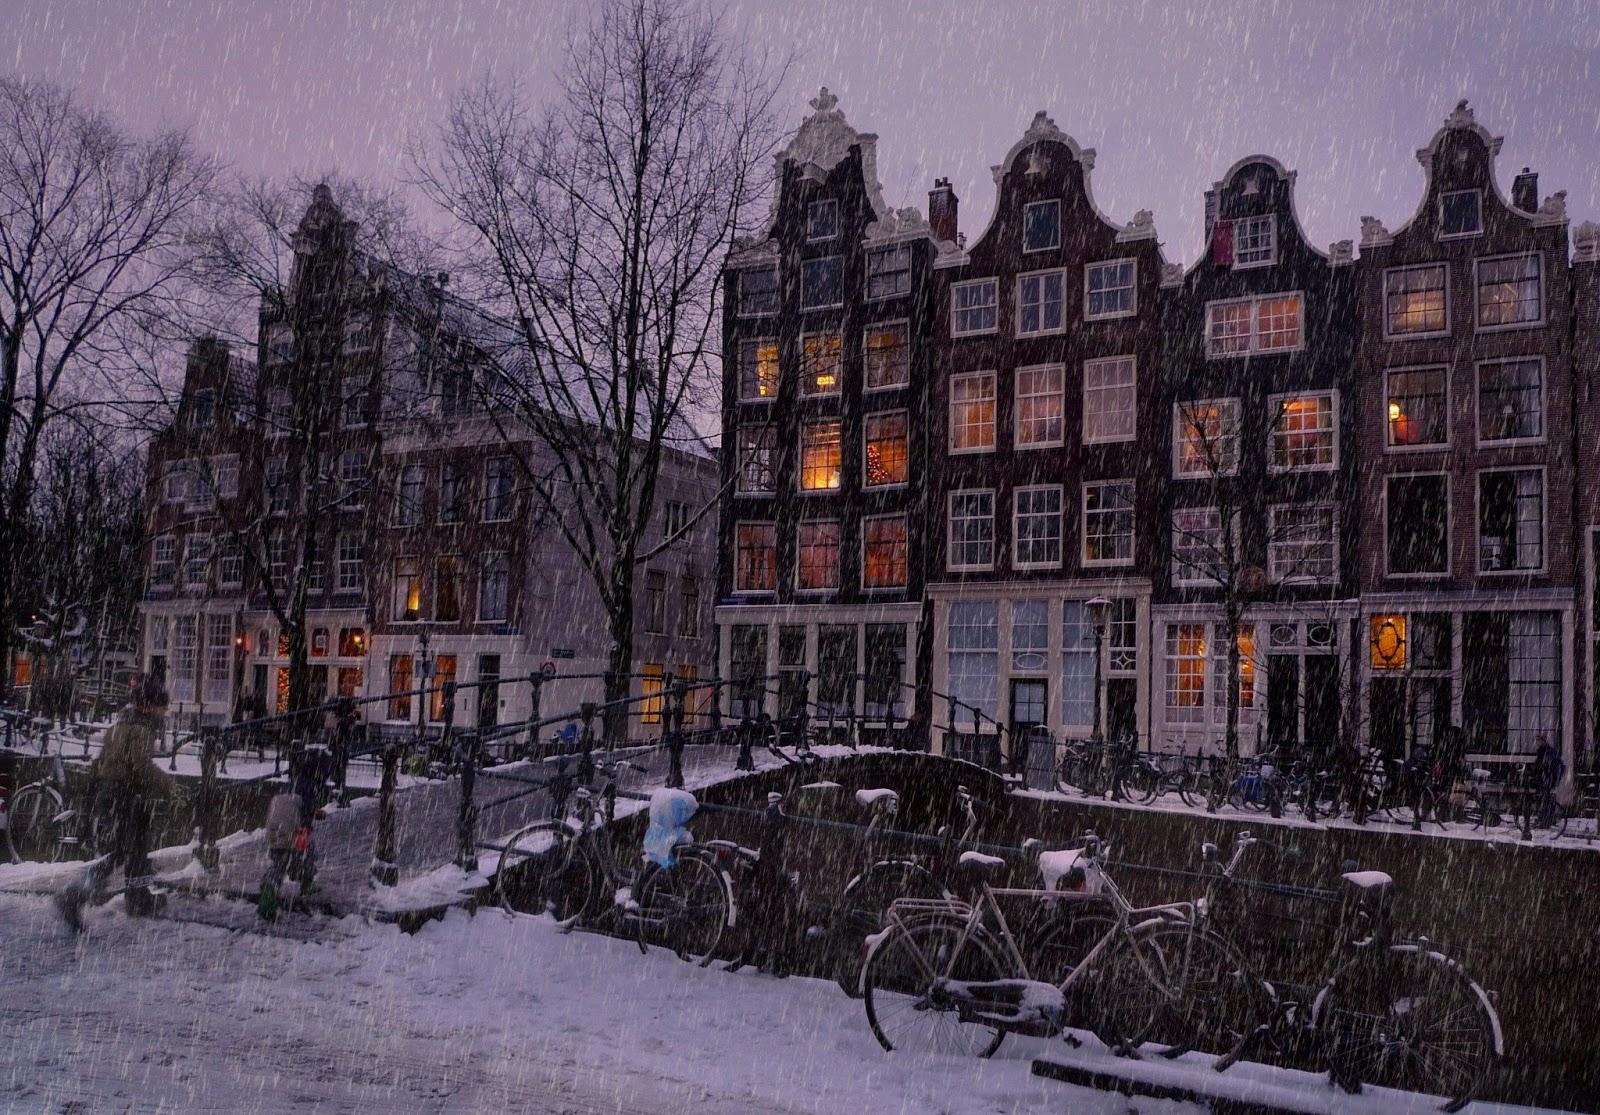 amsterdam capital most visited city of netherlands world. Black Bedroom Furniture Sets. Home Design Ideas